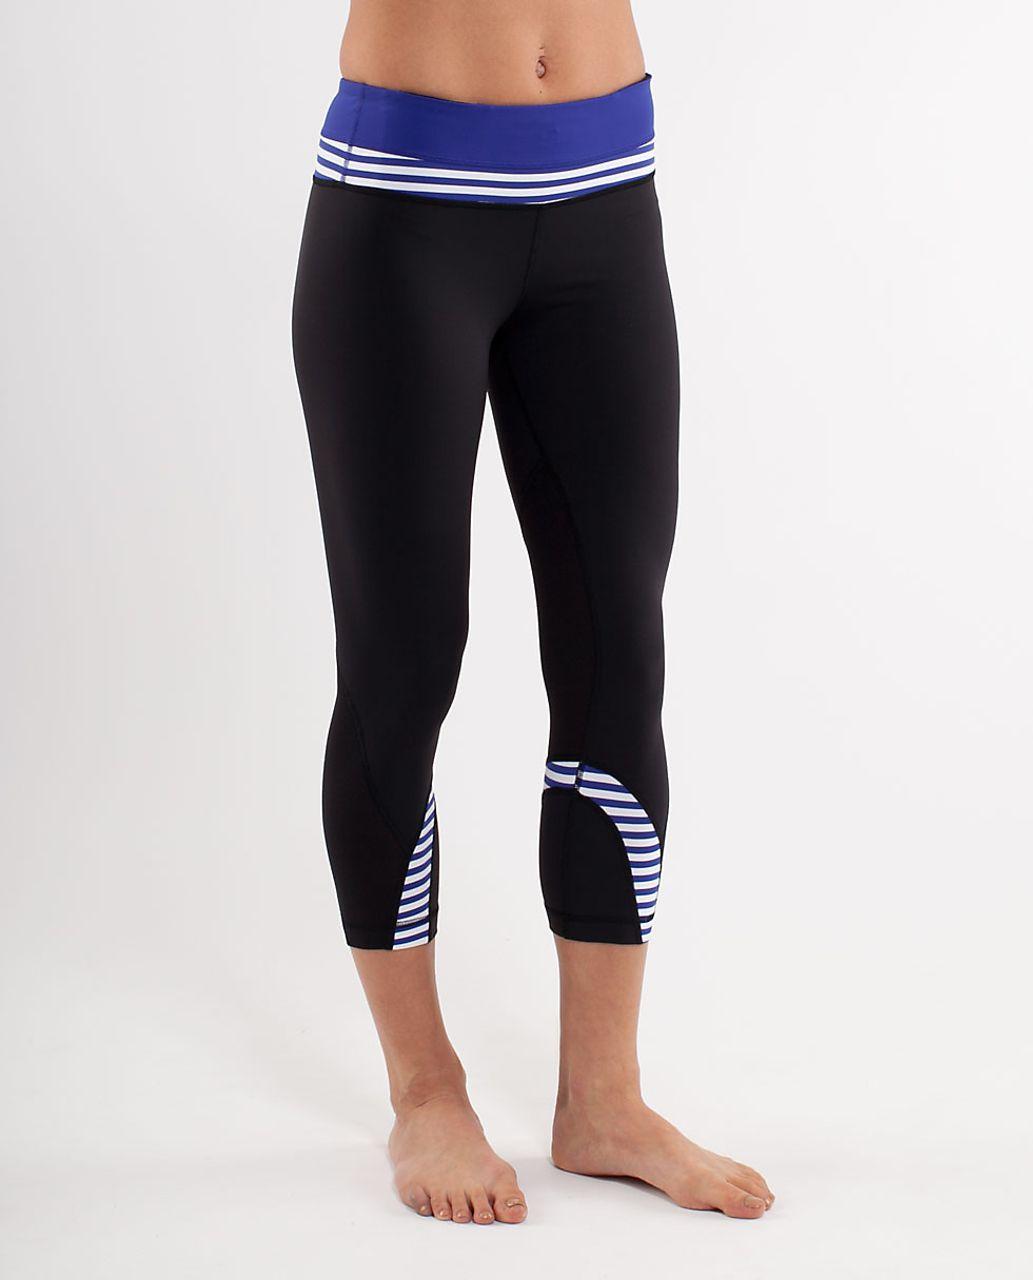 Lululemon Run:  Inspire Crop II - Black /  Pigment Blue White Narrow Bold Stripe /  Heathered Pigment Blue